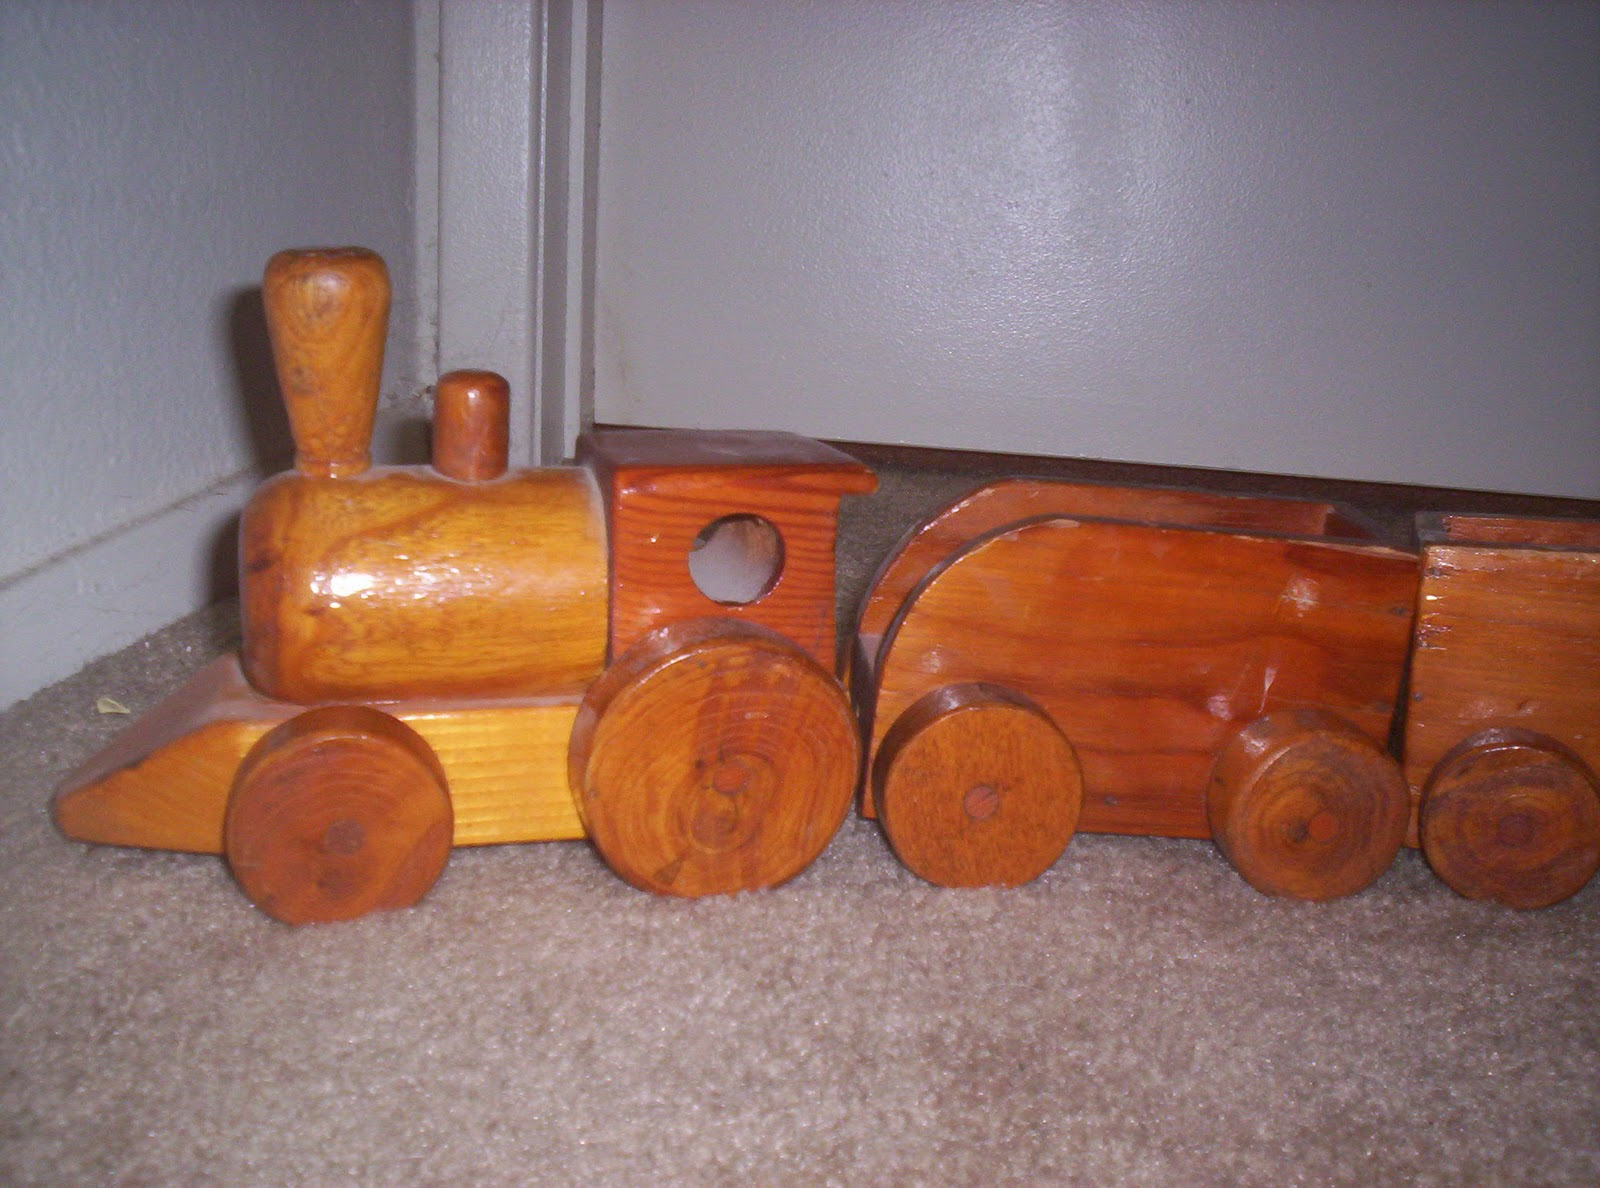 Effortless Wood Work for Small children